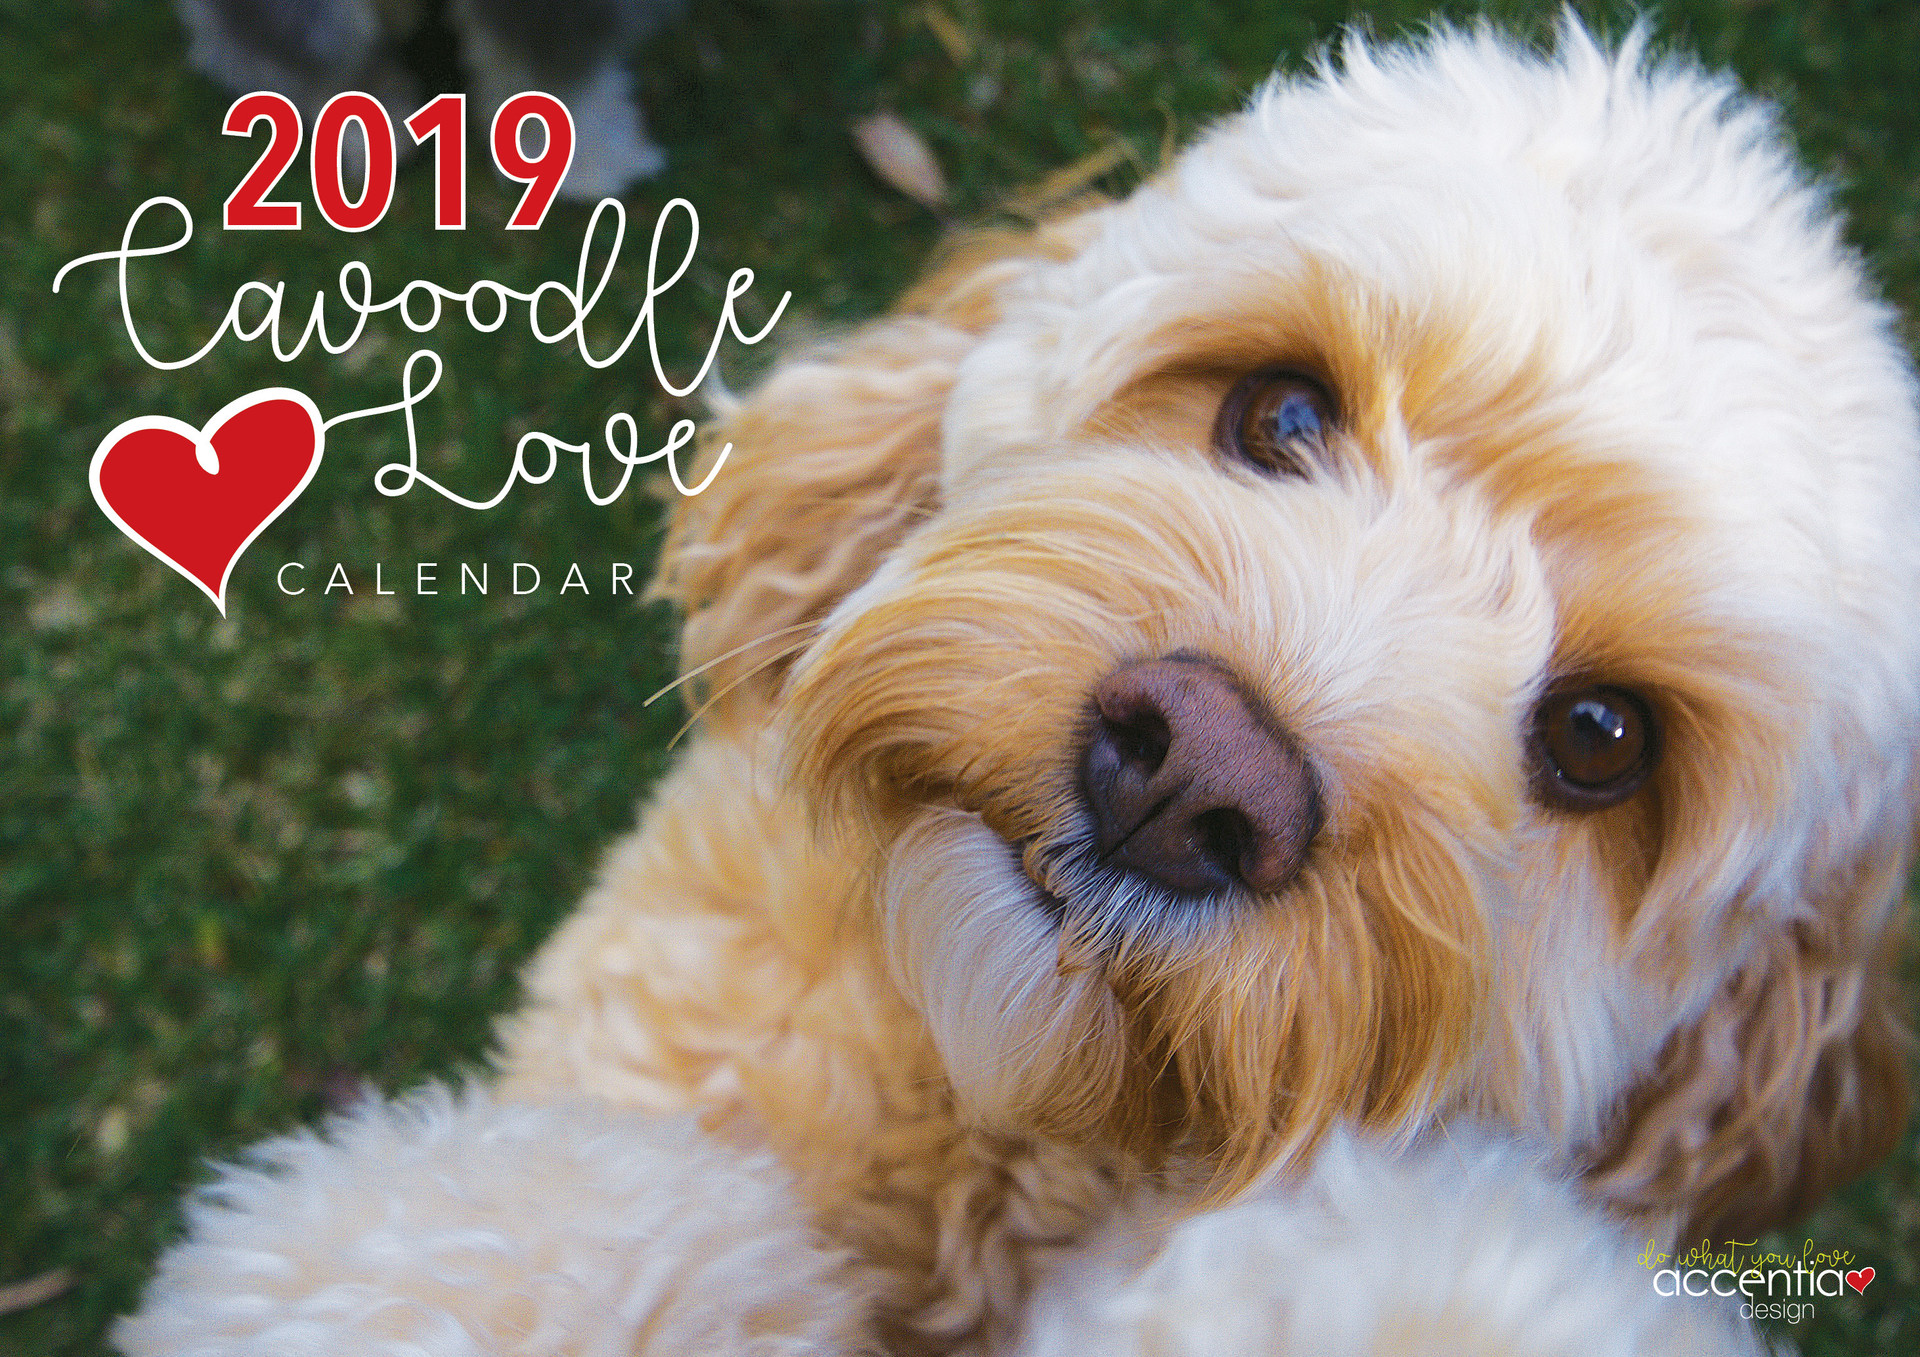 2019 Cavoodle Calendar Cover Final.jpg